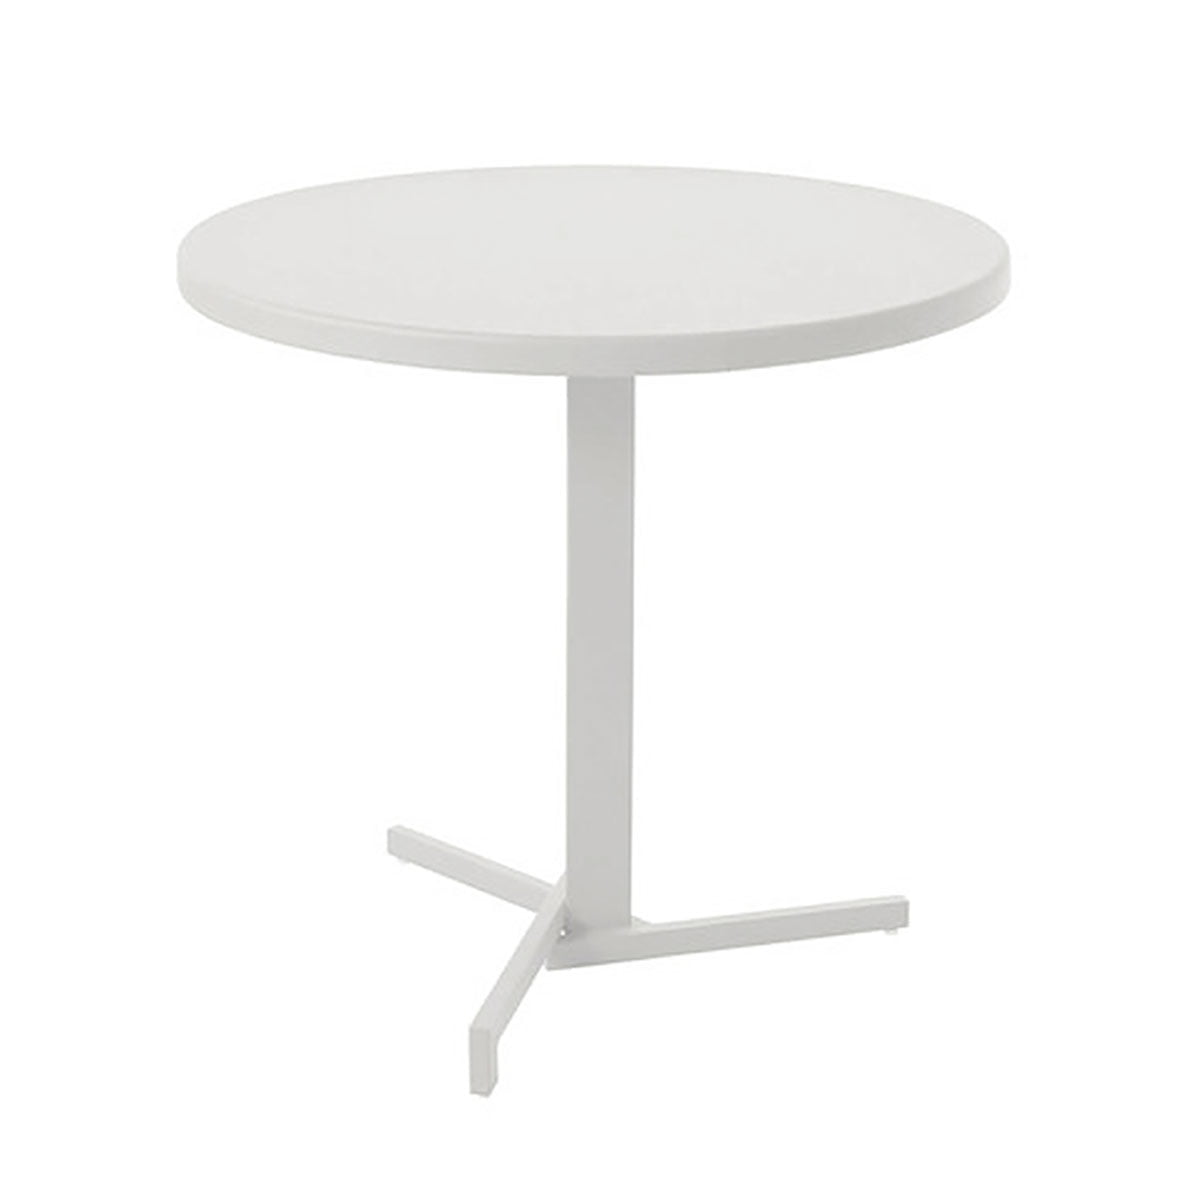 The Mia Bistro Table Ø 80 Cm In White By Emu